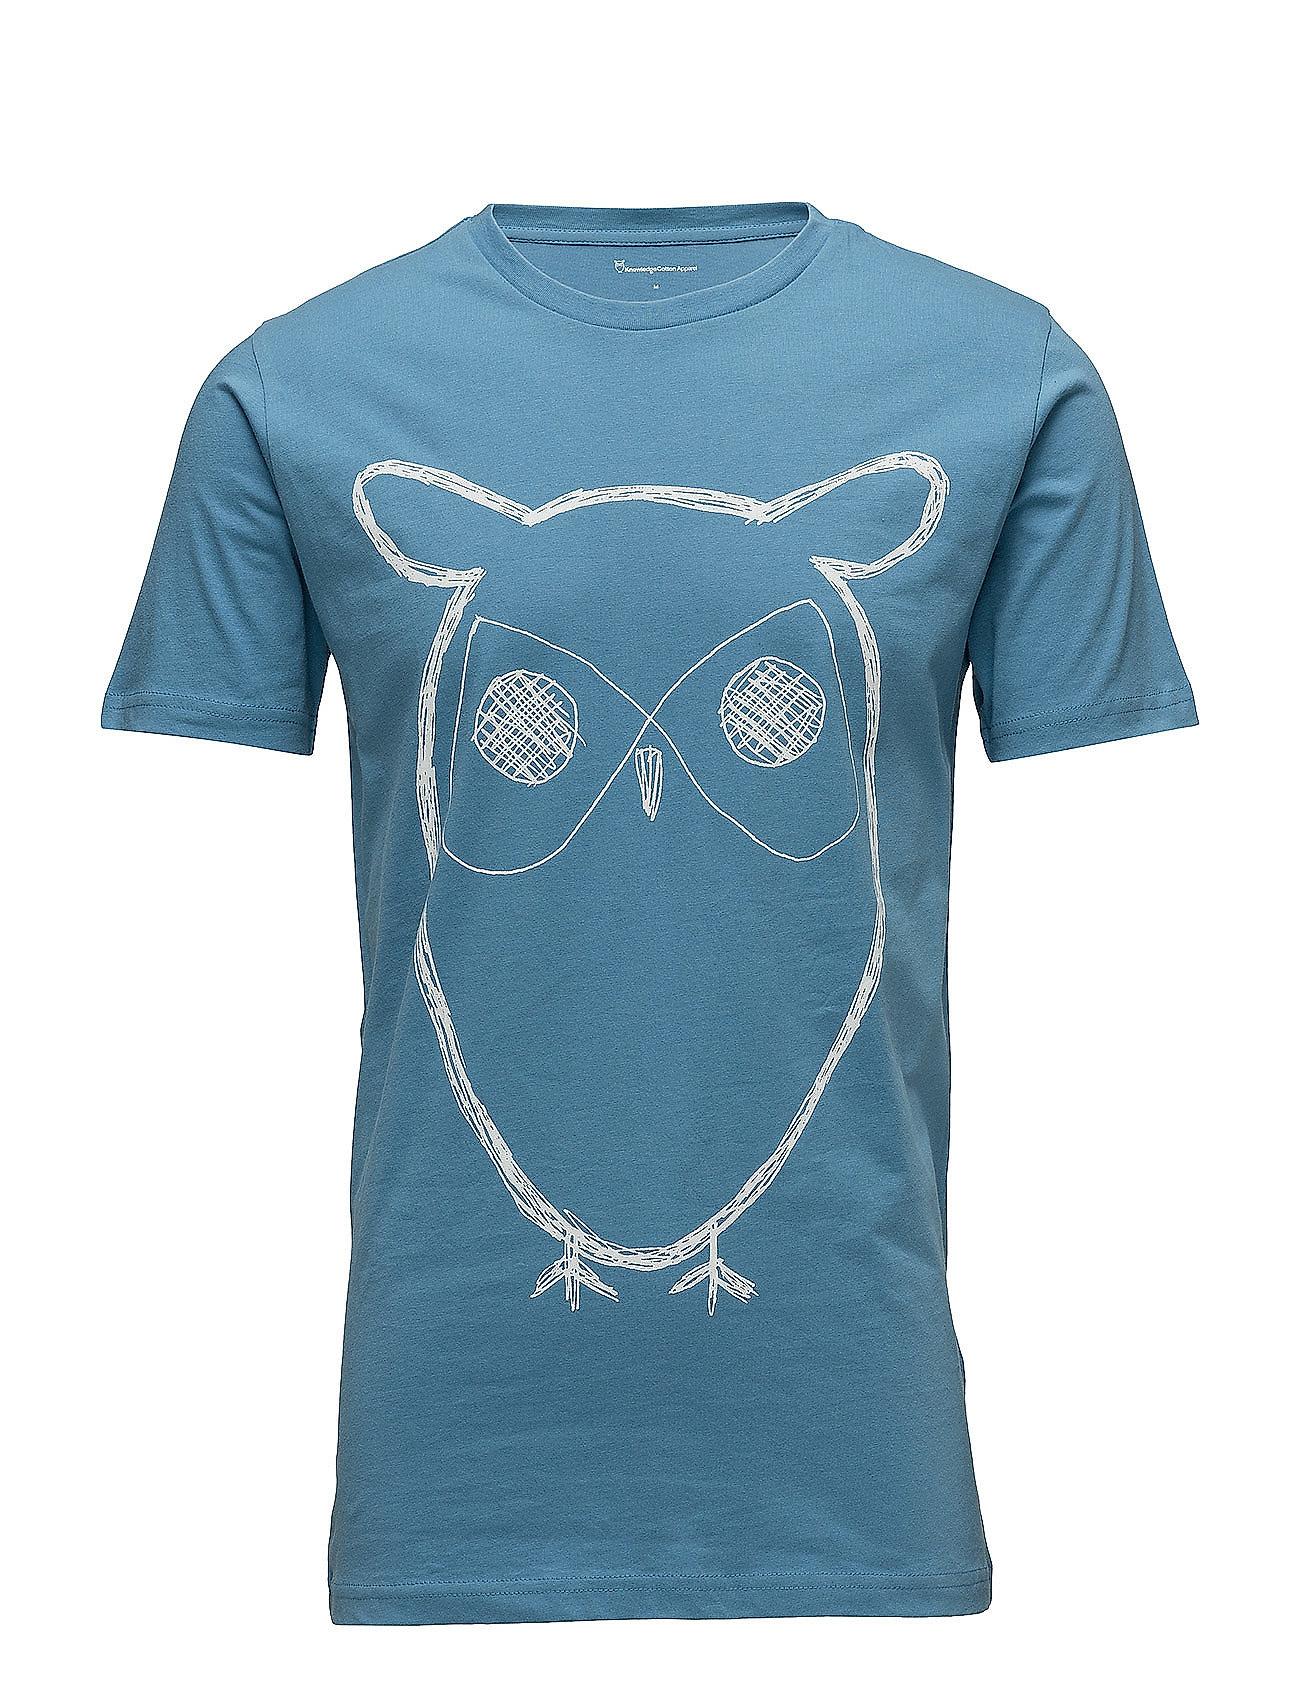 Knowledge Cotton Apparel ALDER big owl tee - GOTS/Vegan - NIAGARA